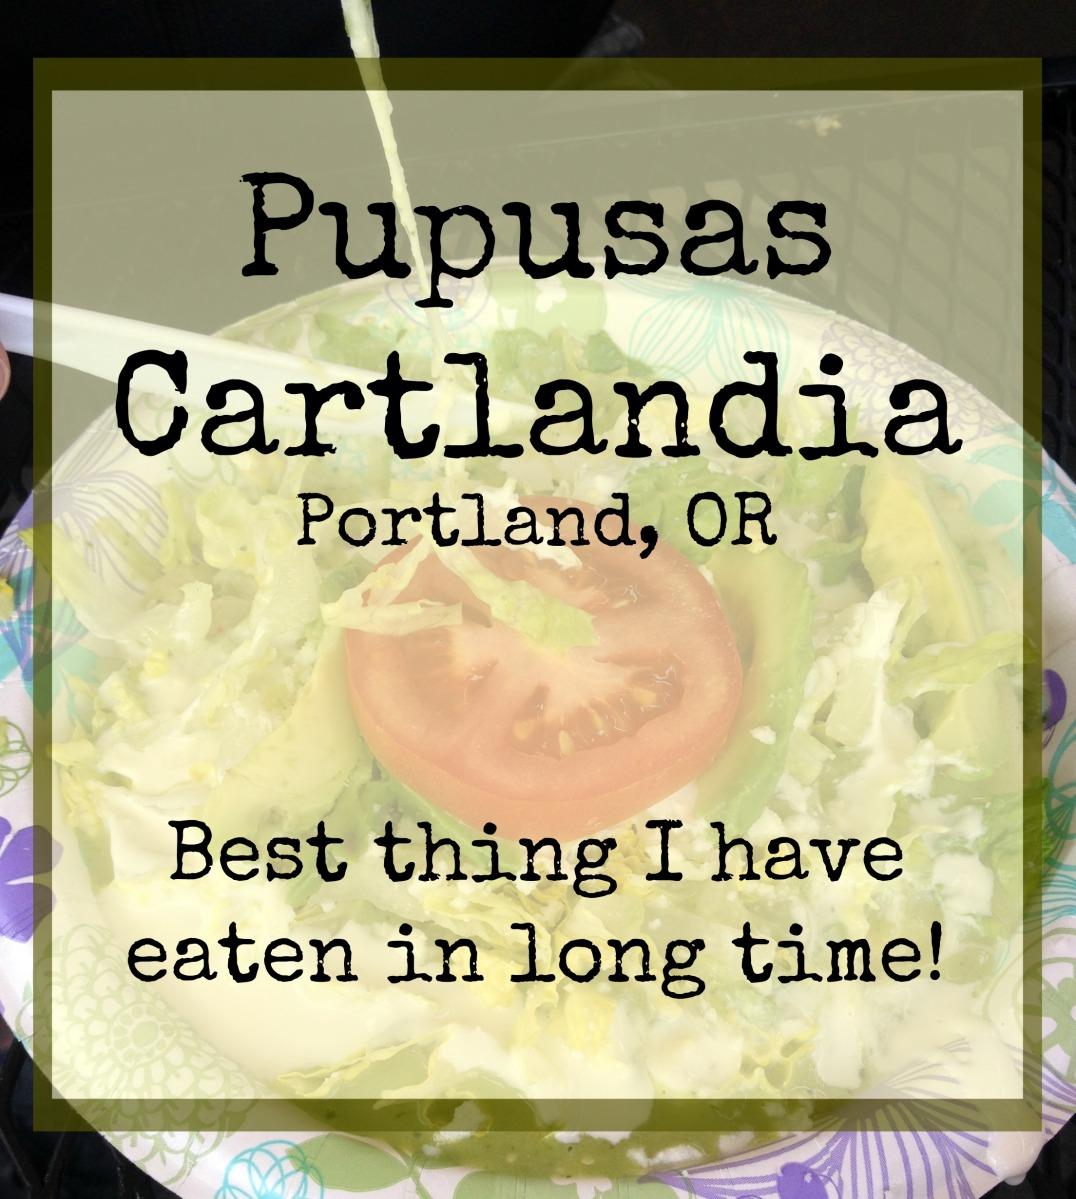 Pupusas, Cartlandia, Portland, Oregon